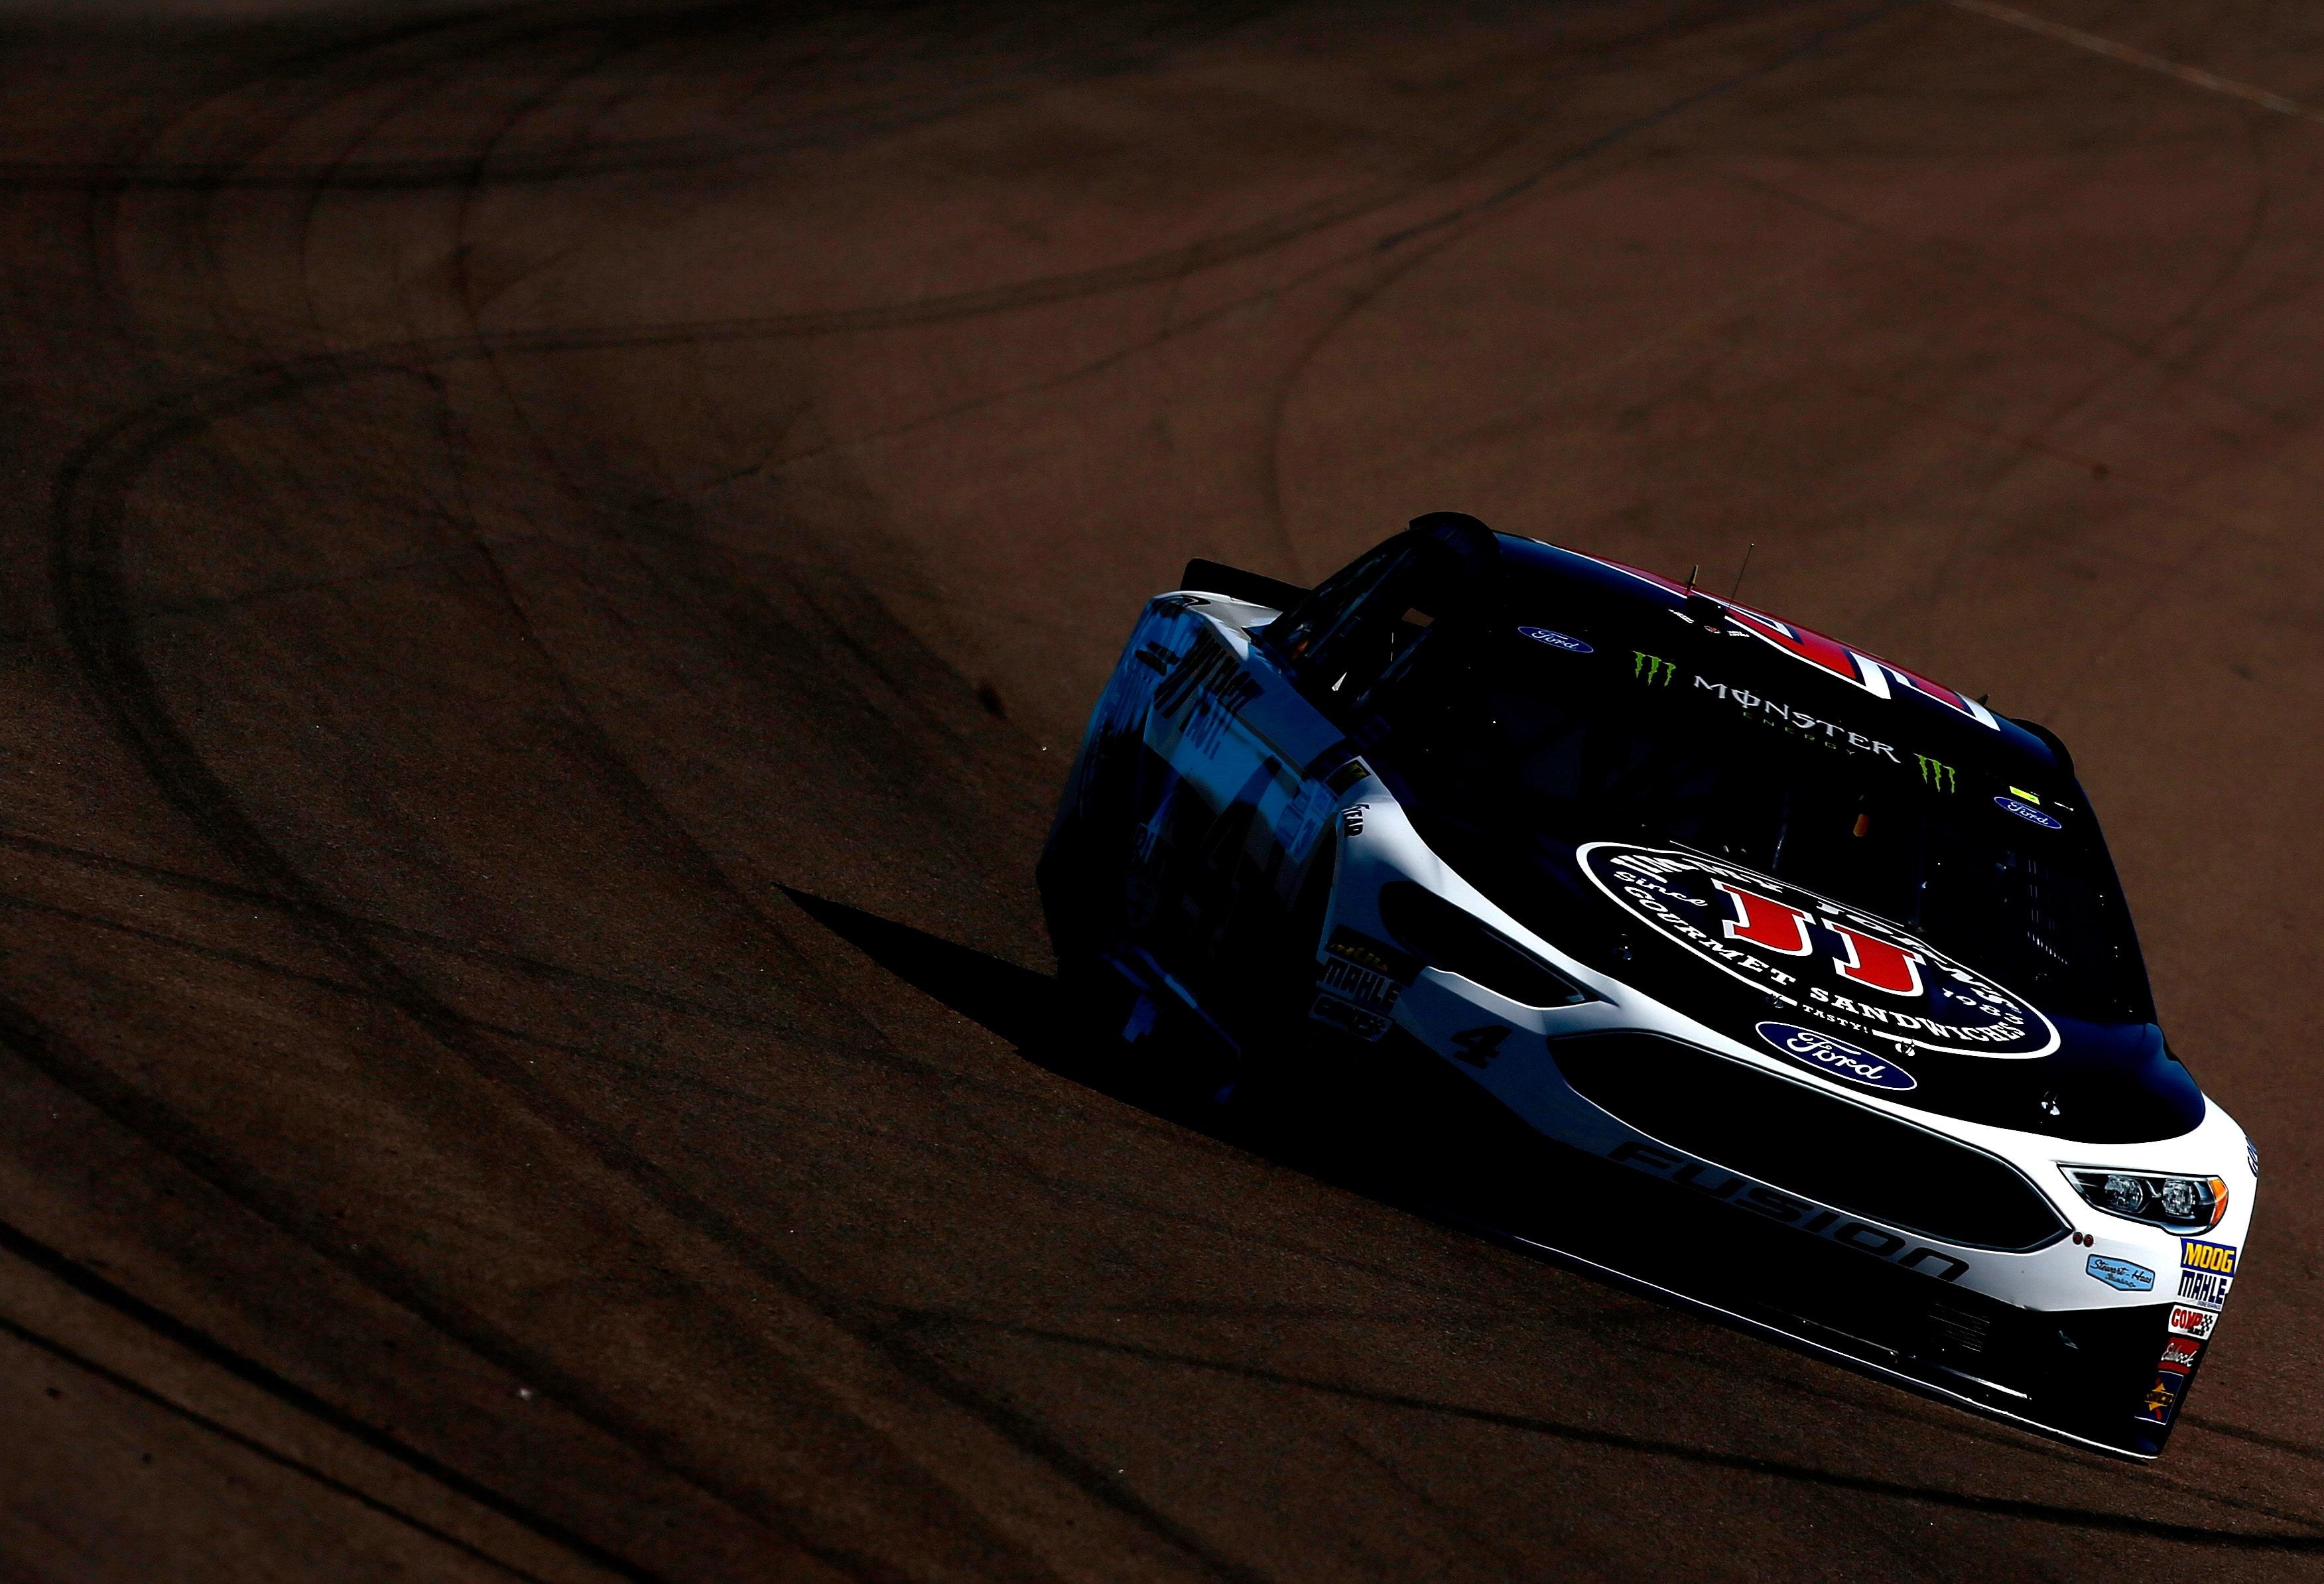 Kevin Harvick Phoenix International Raceway Penalty